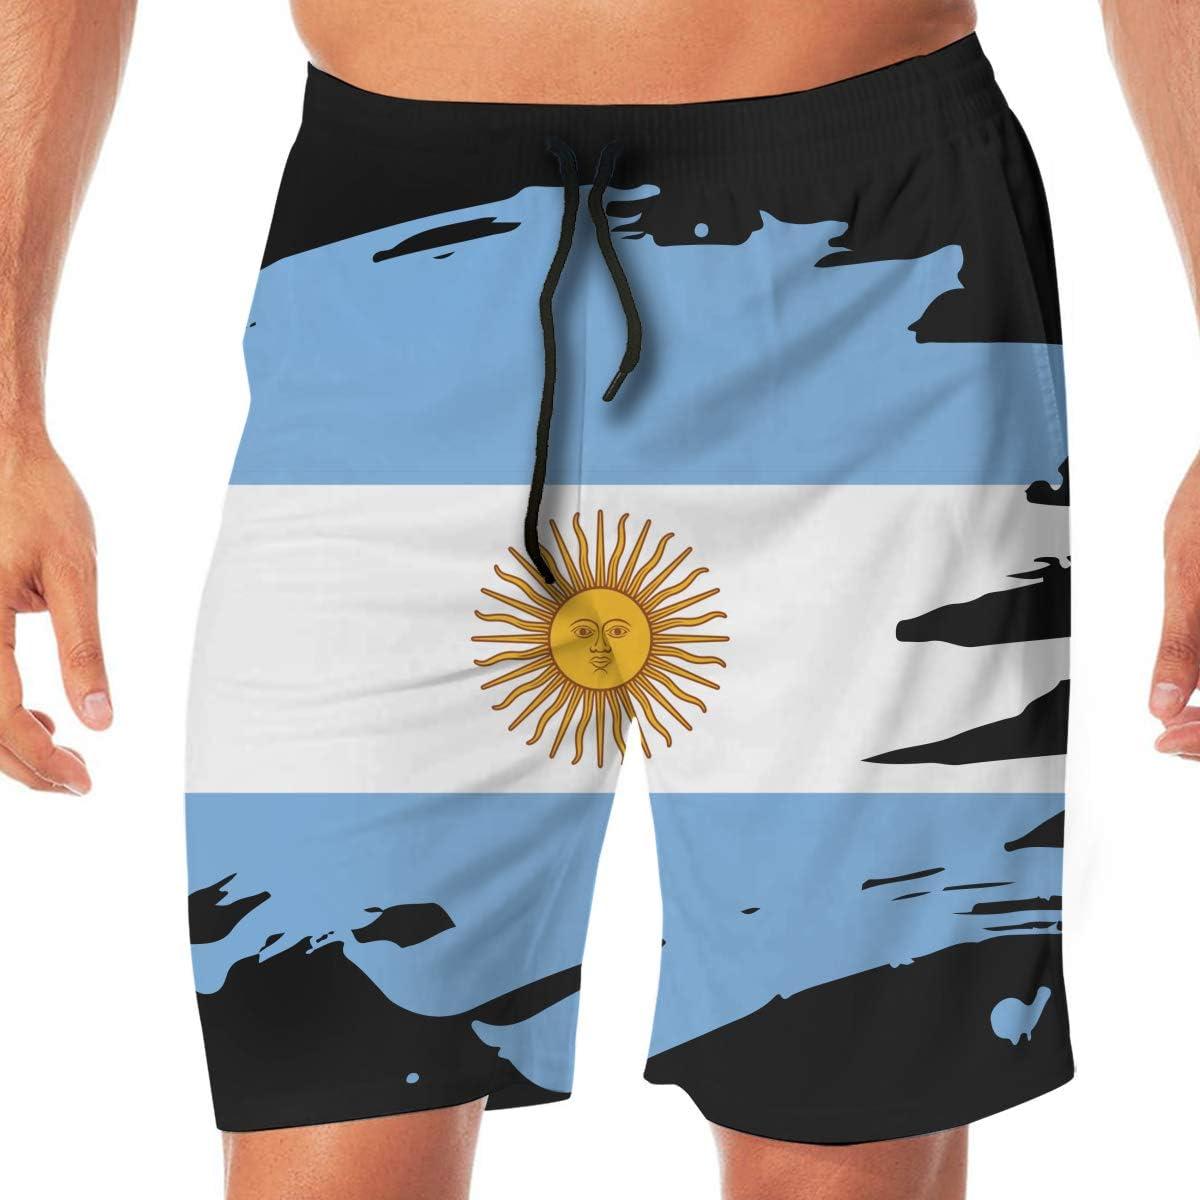 Mens Argentina Paint Splatter Flag Board Shorts Swim Trunks No Mesh Lining